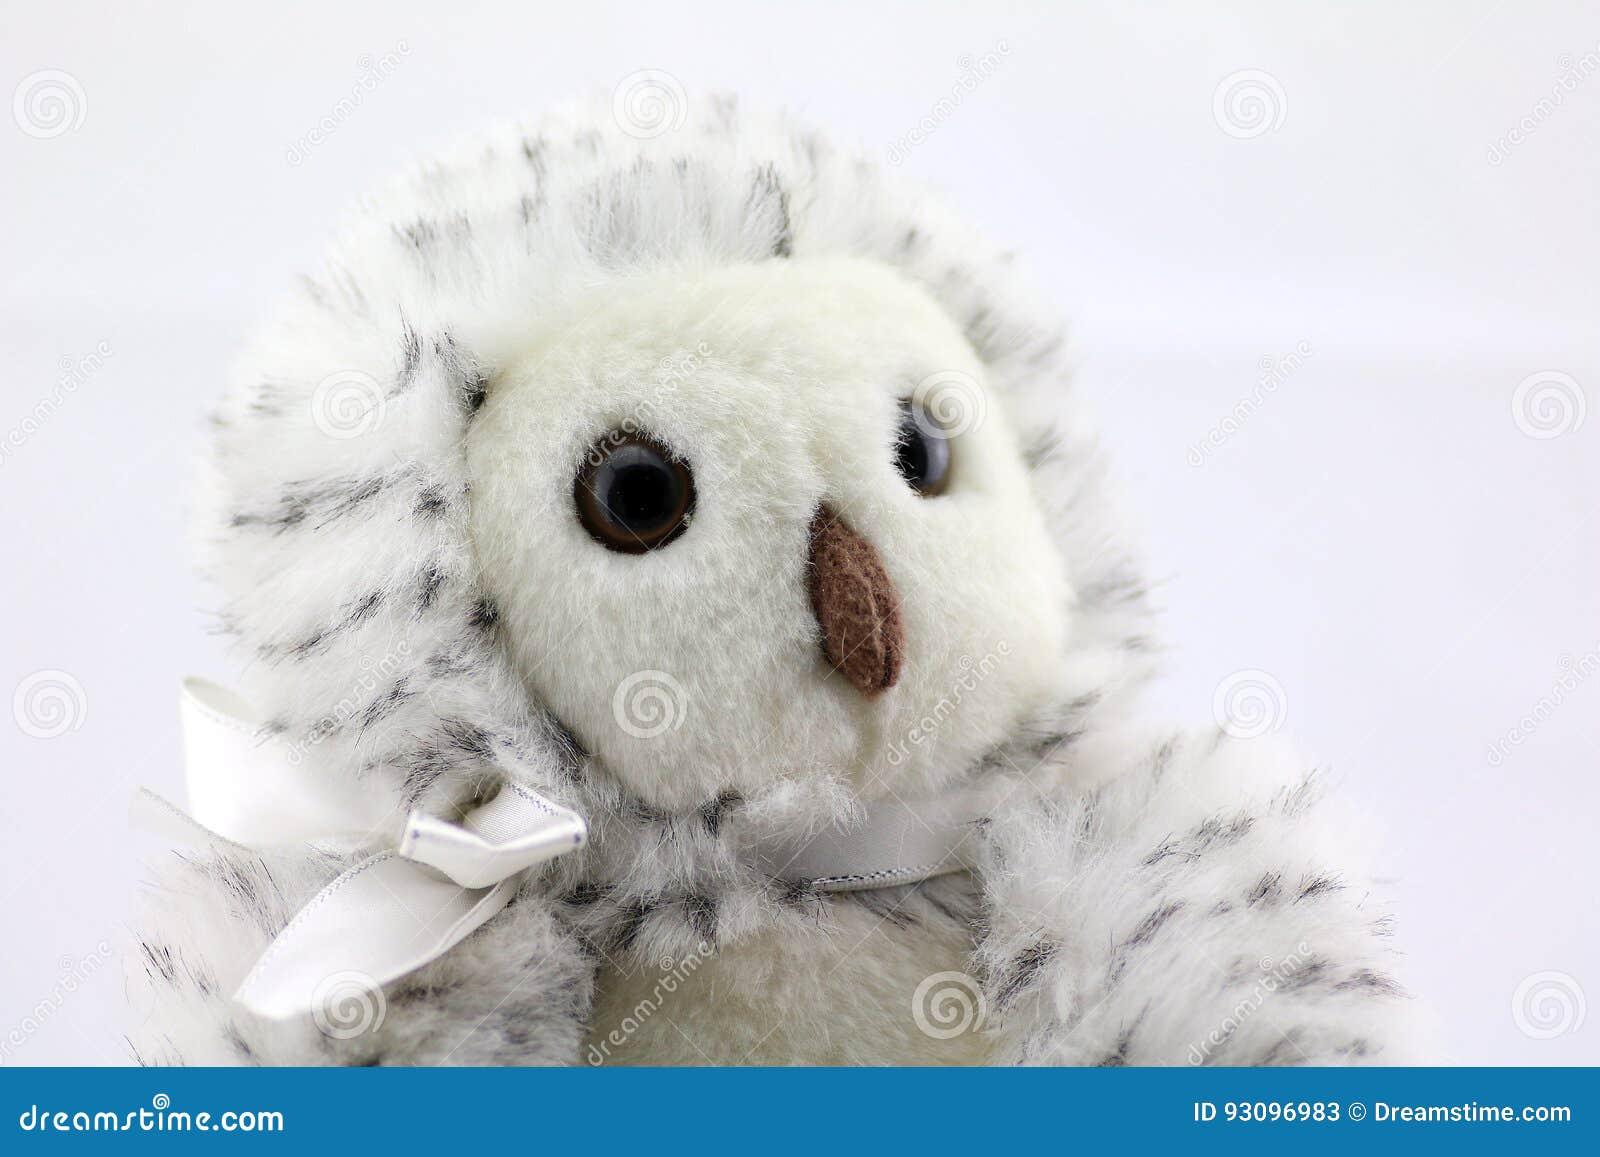 Owl Stuffed Animal Stock Image Image Of Animal Adorable 93096983